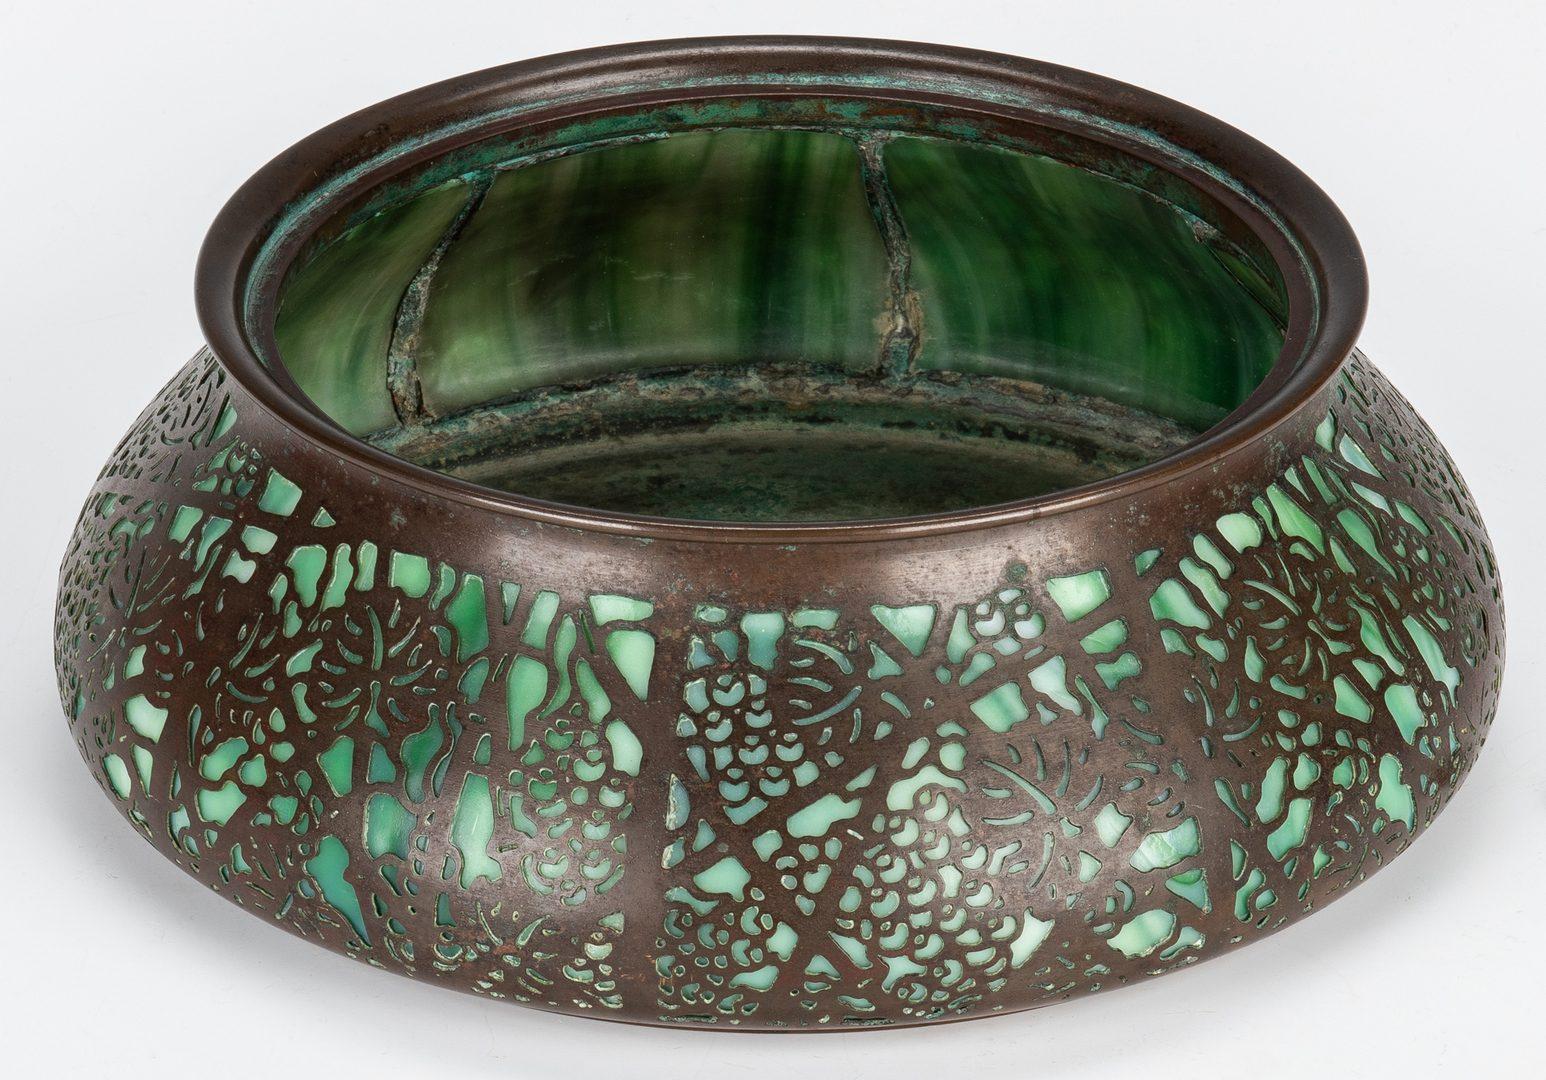 Lot 576: Tiffany Studios Glass and Bronze Jardiniere